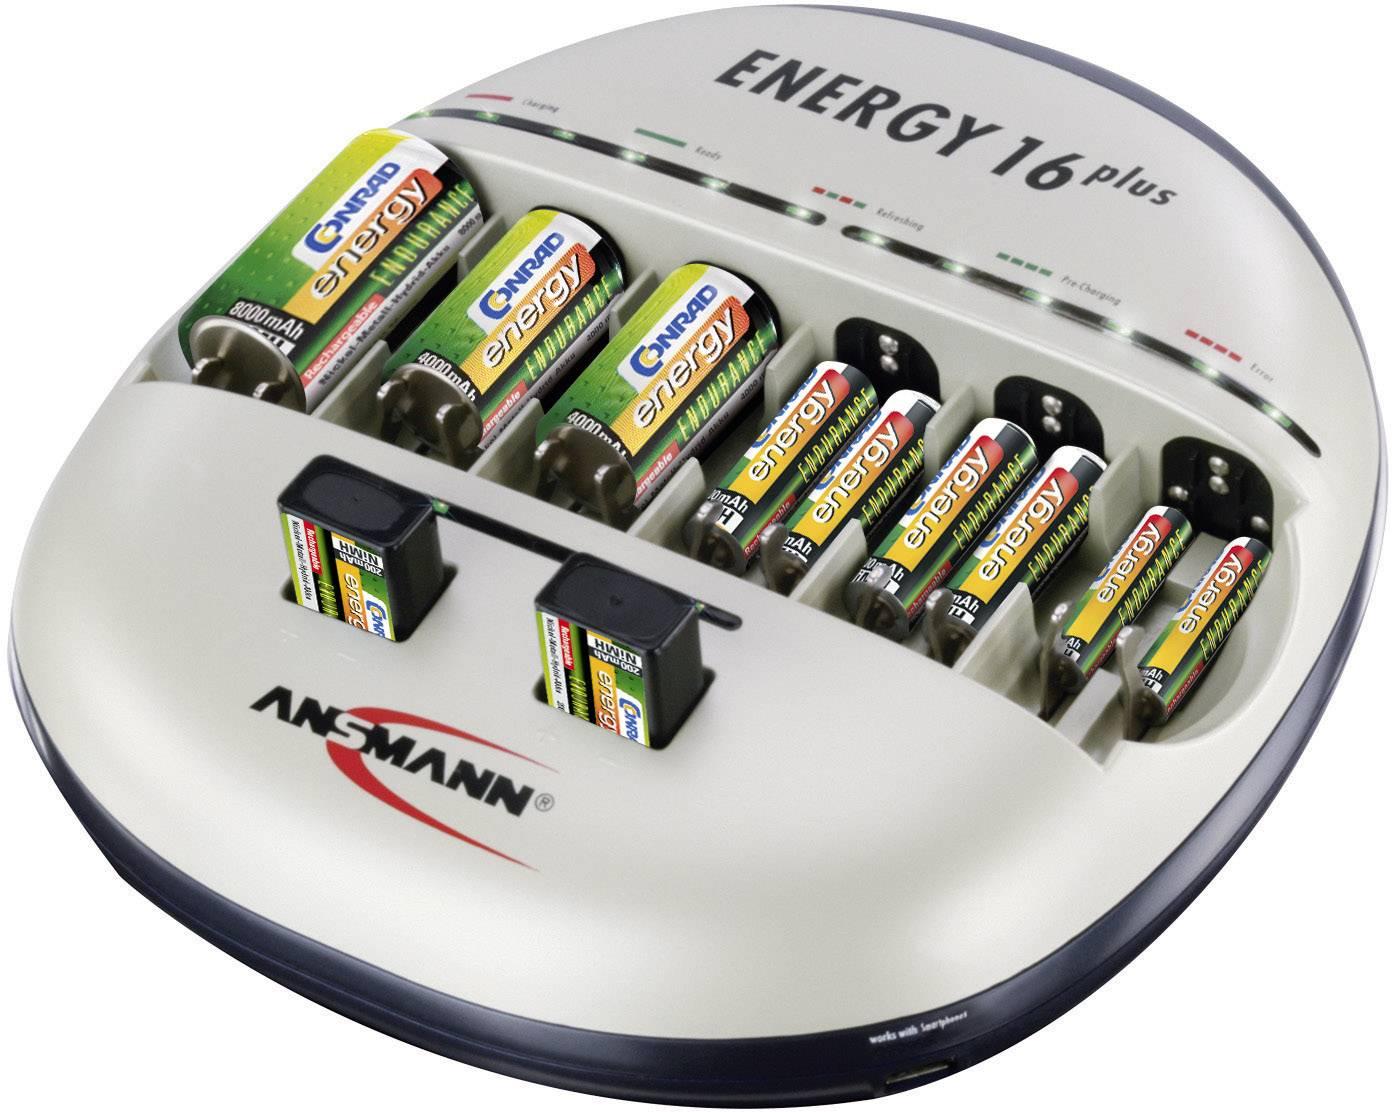 Nabíjačka na okrúhle akumulátory Ansmann Energy 16 plus, 1001-0004-510, micro (AAA), mignon (AA), baby (C), mono (D), 9 V blok